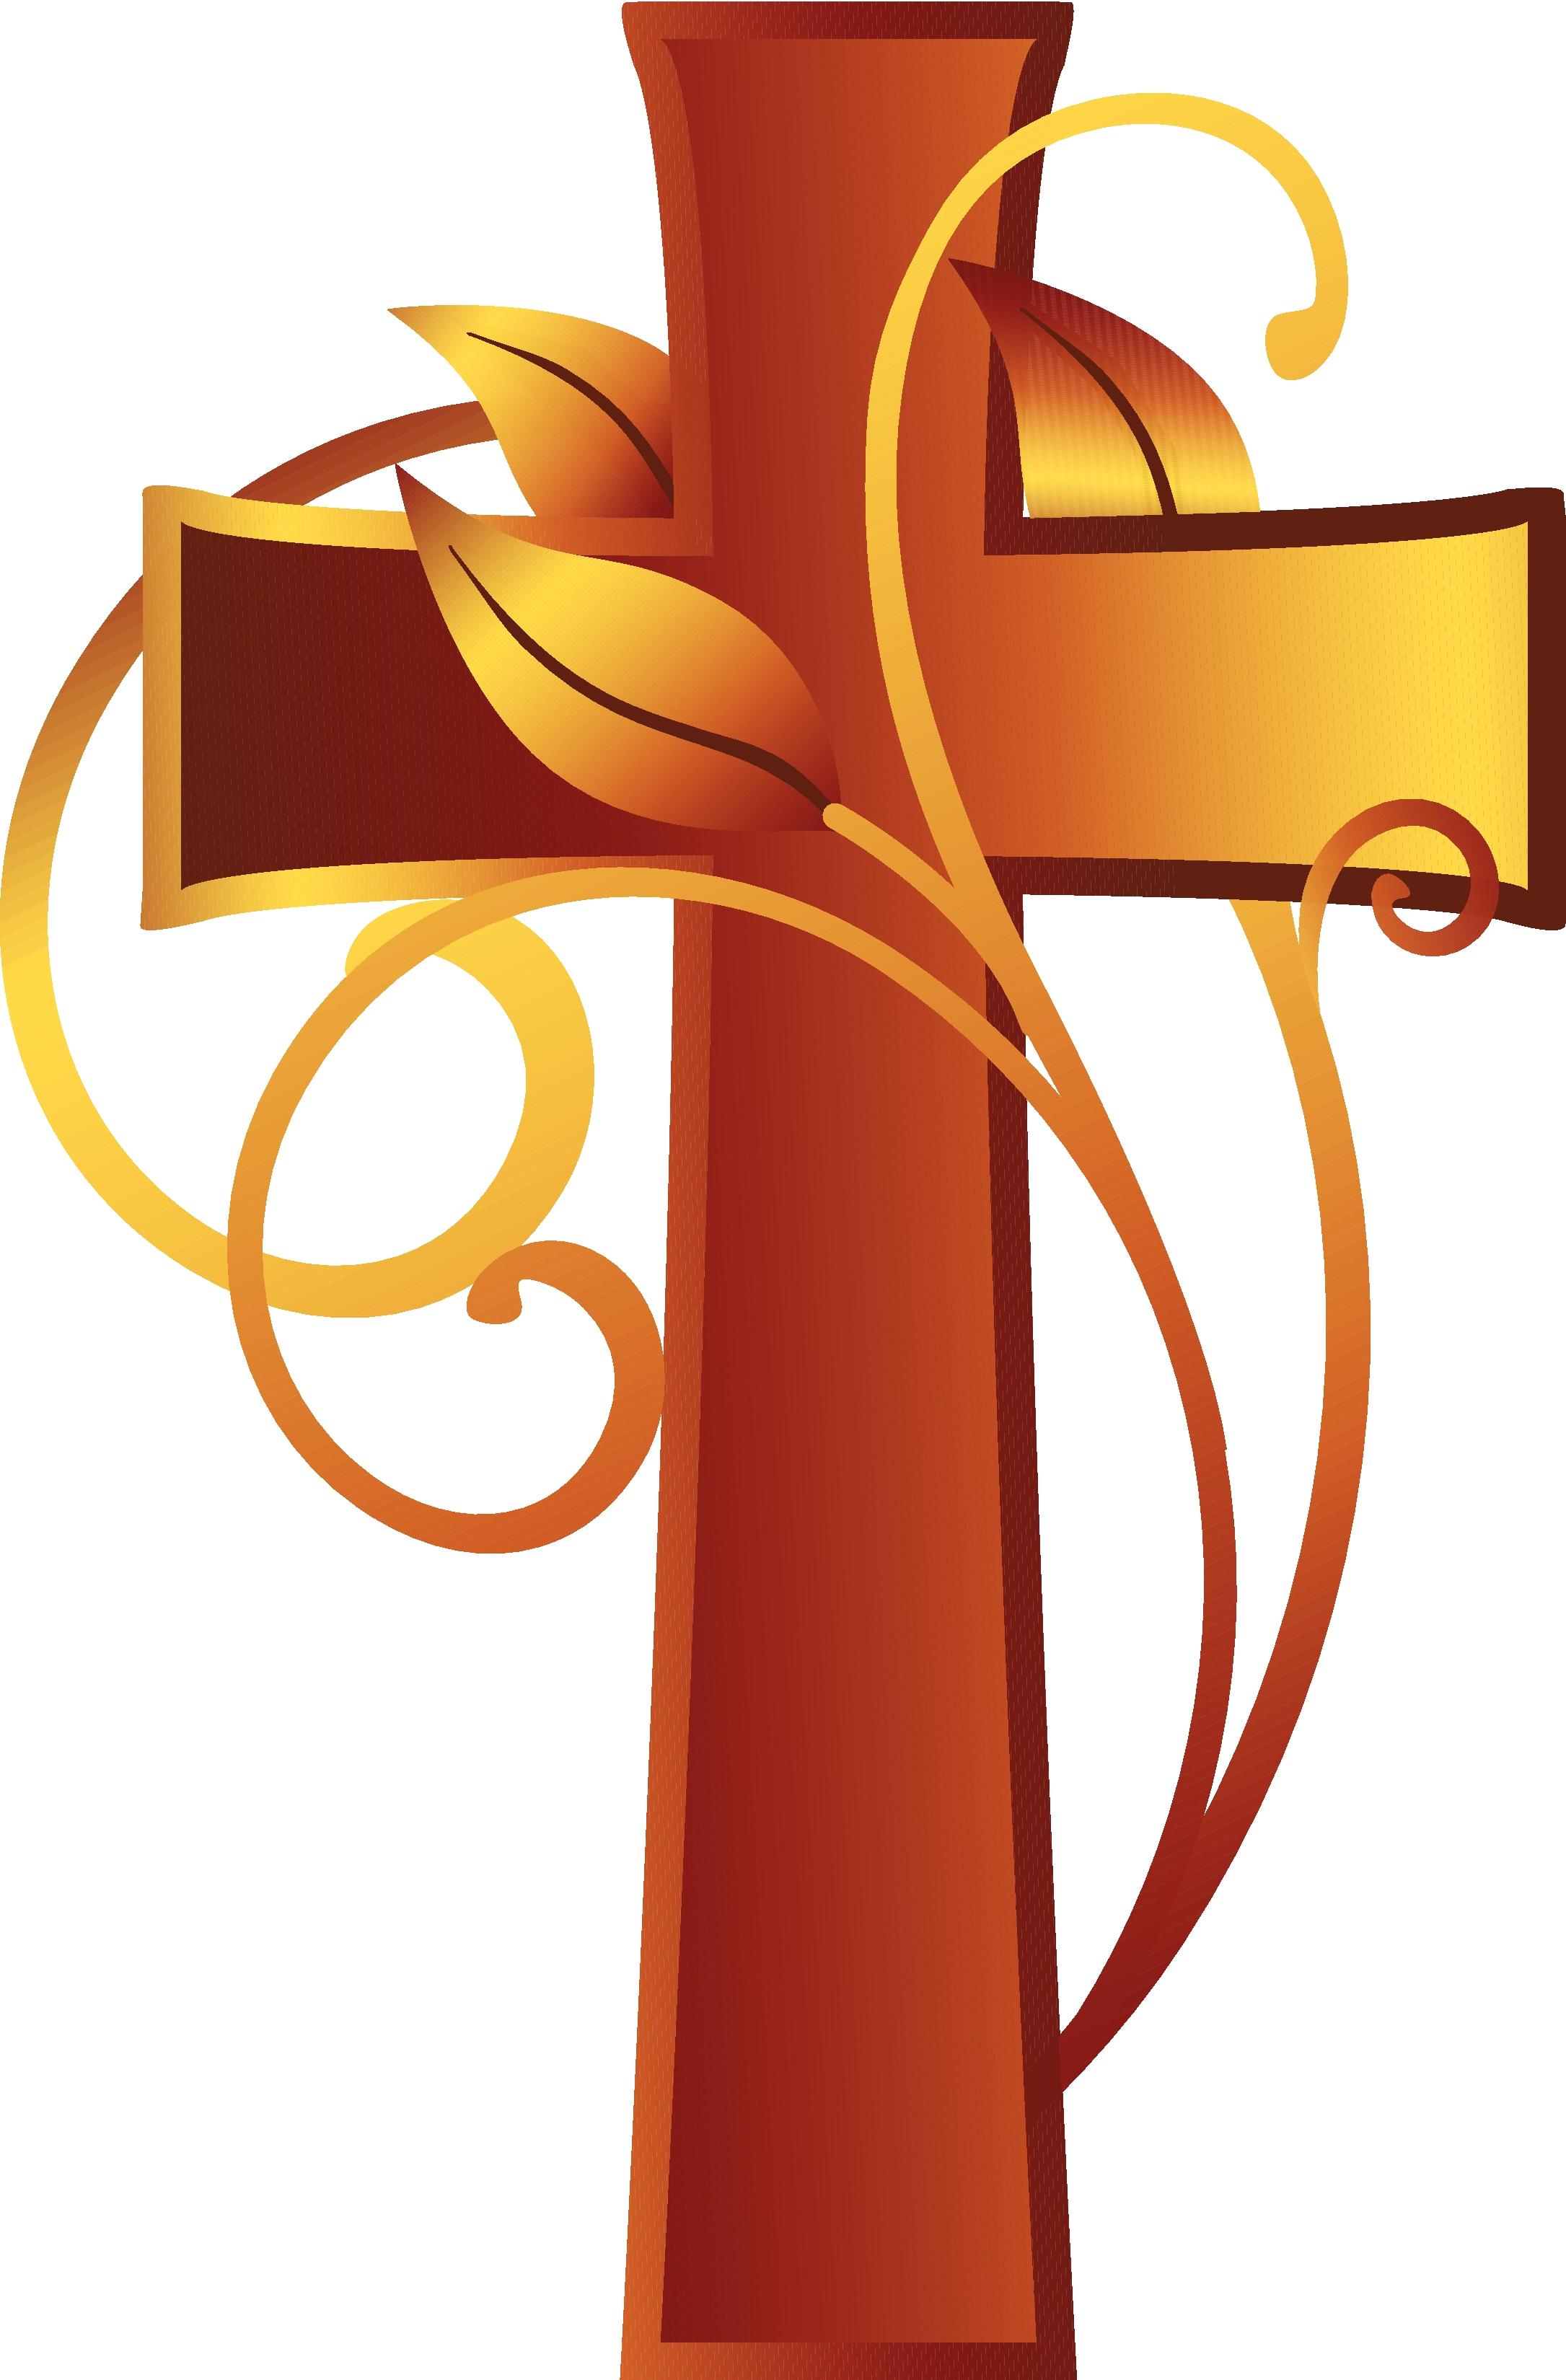 Religious free christian clip art graphi-Religious free christian clip art graphics animations and-2